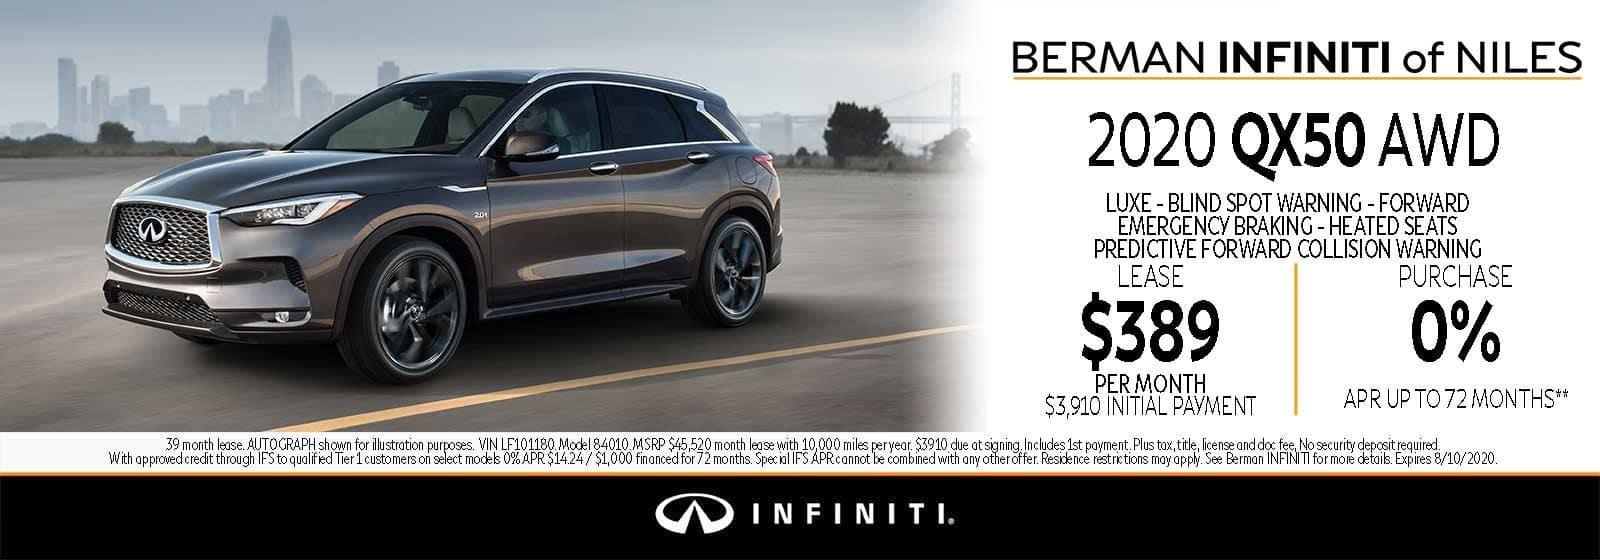 New 2020 INFINITI QX50 August Offer at Berman INFINITI of Niles!